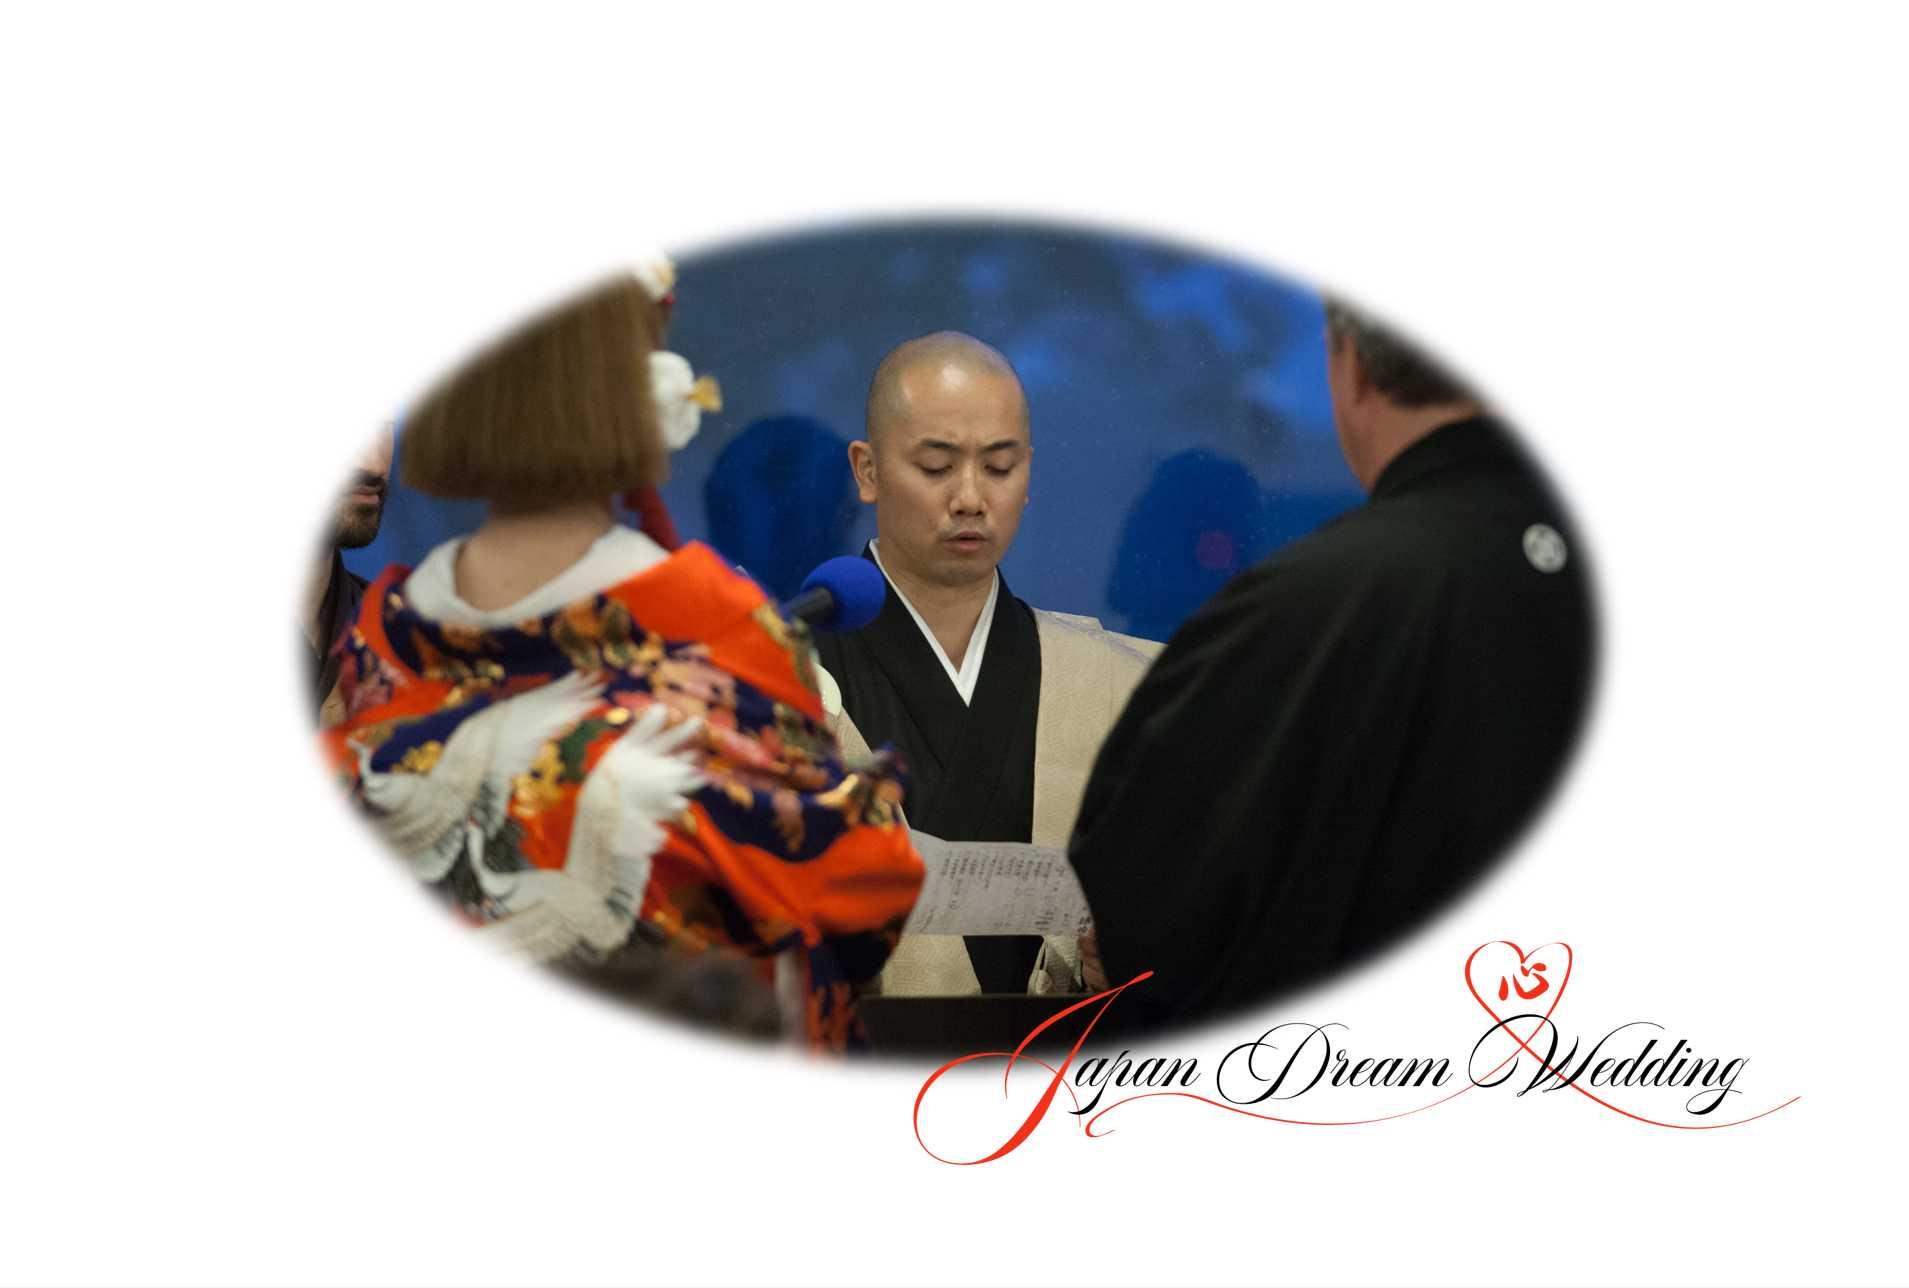 Japan Dream Wedding Officient services